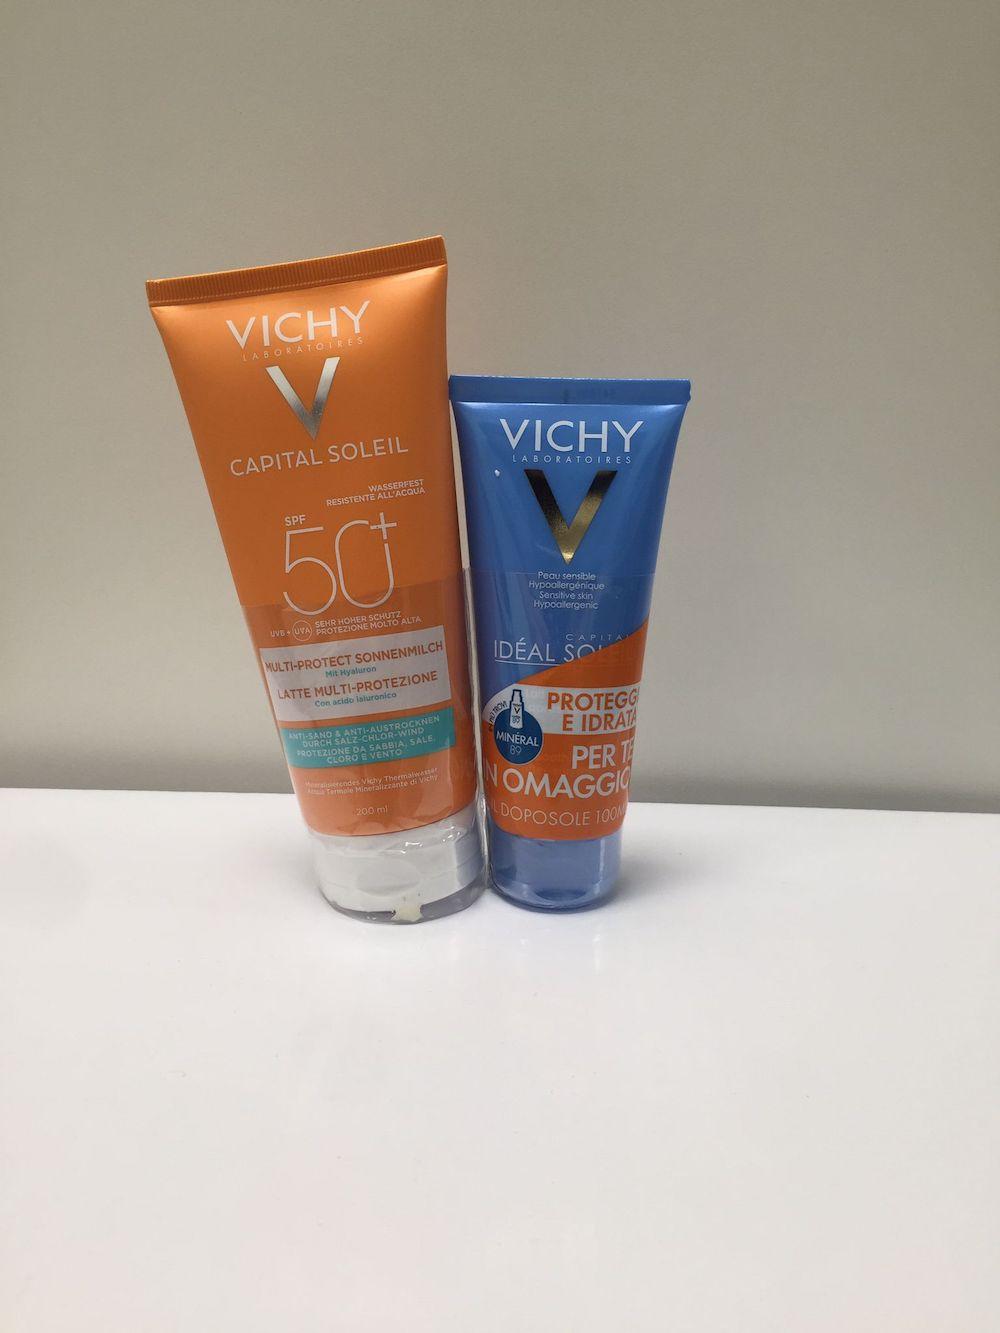 Vichy Capital Soleil Sleever Beach Protetct Latte SPF50 + Doposole 100ml  - Arcafarma.it